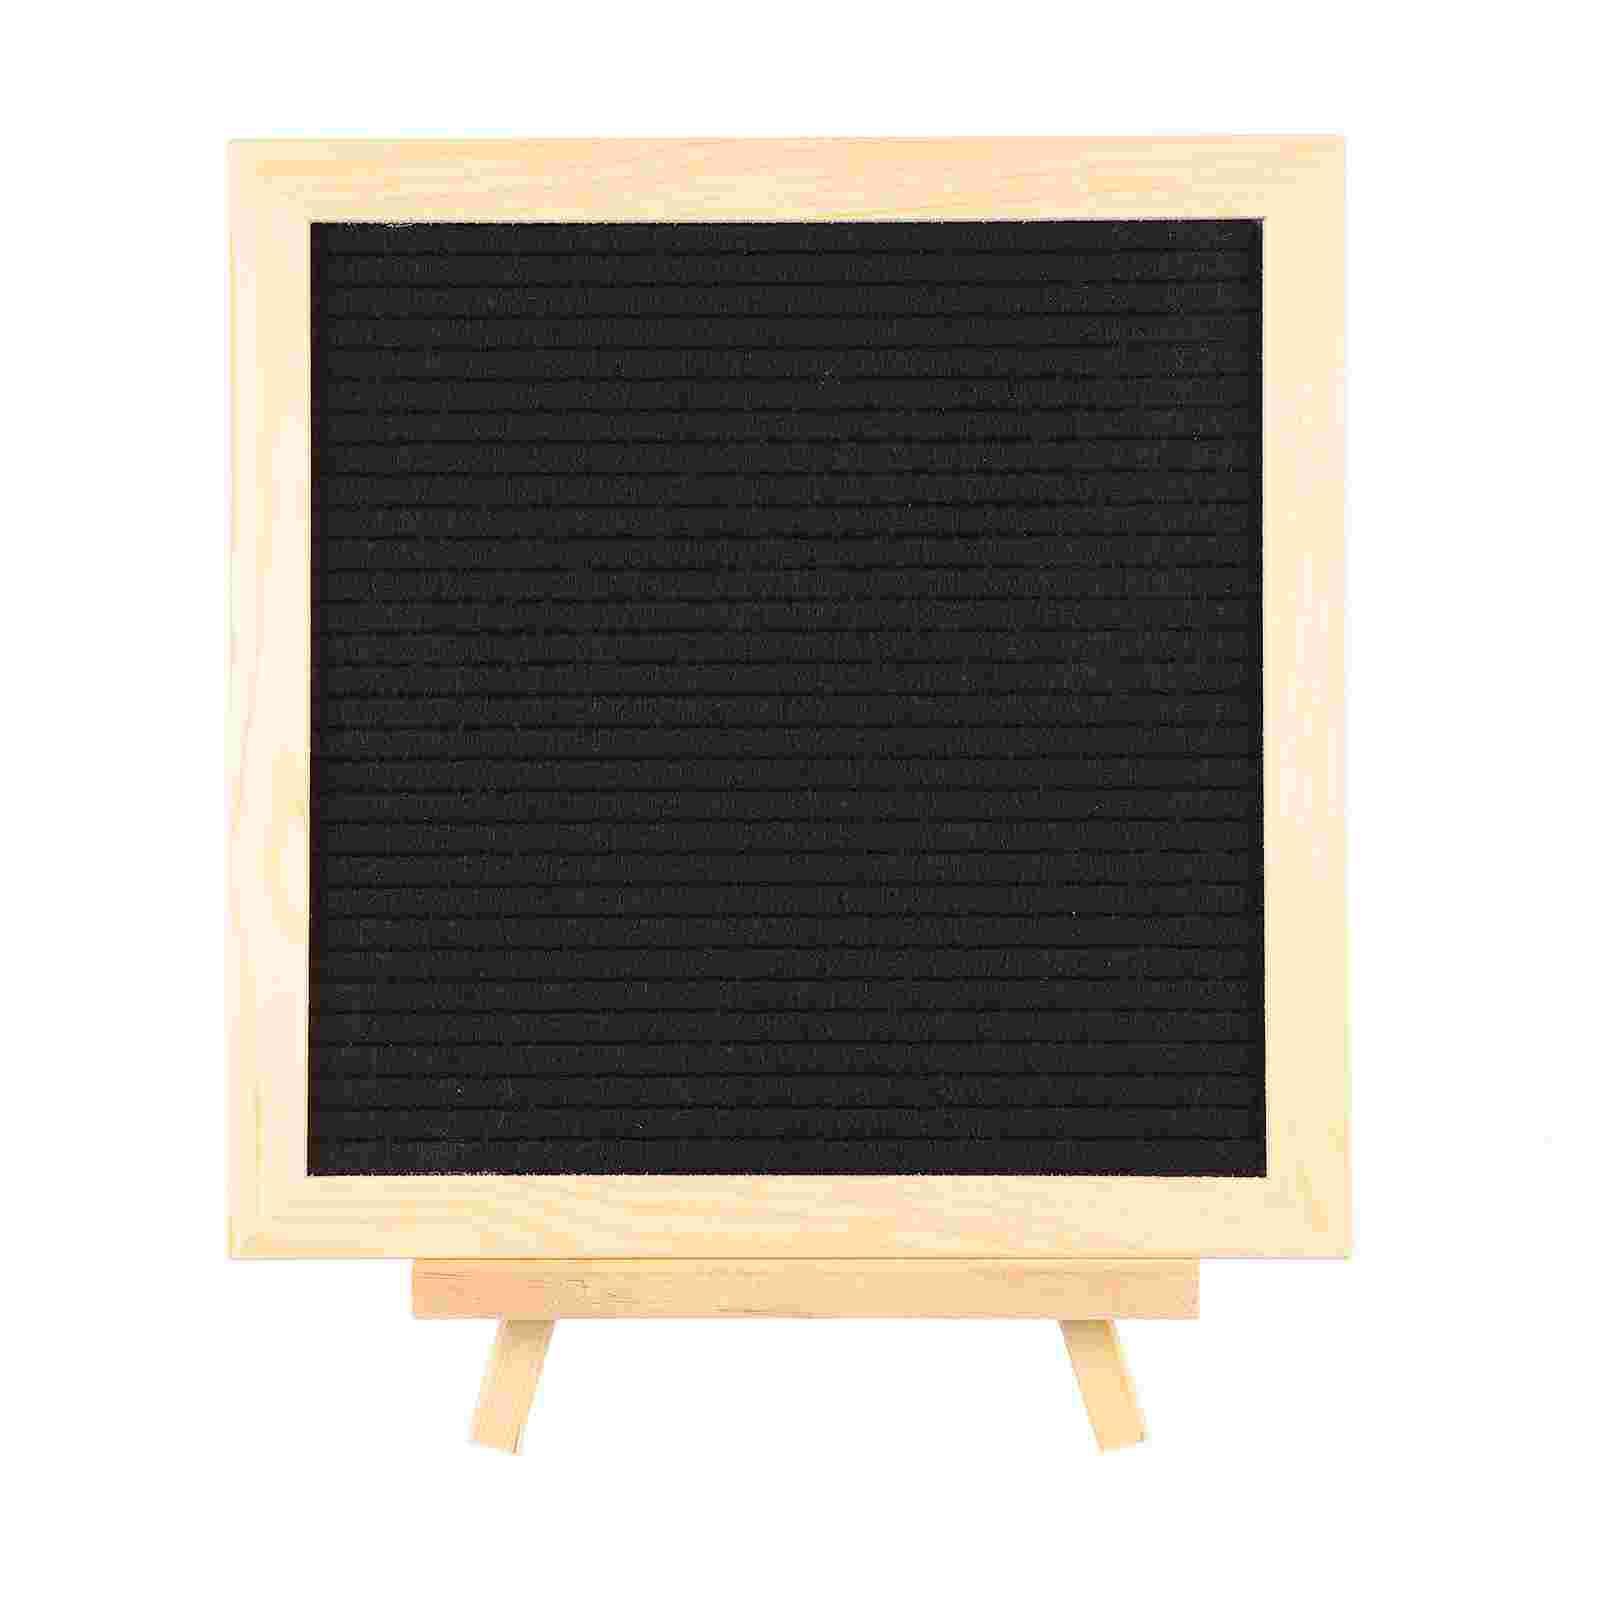 1 Set Message Boards Home Decor DIY Felt Boards Decorative Felt Boards cyril chern chern on dispute boards